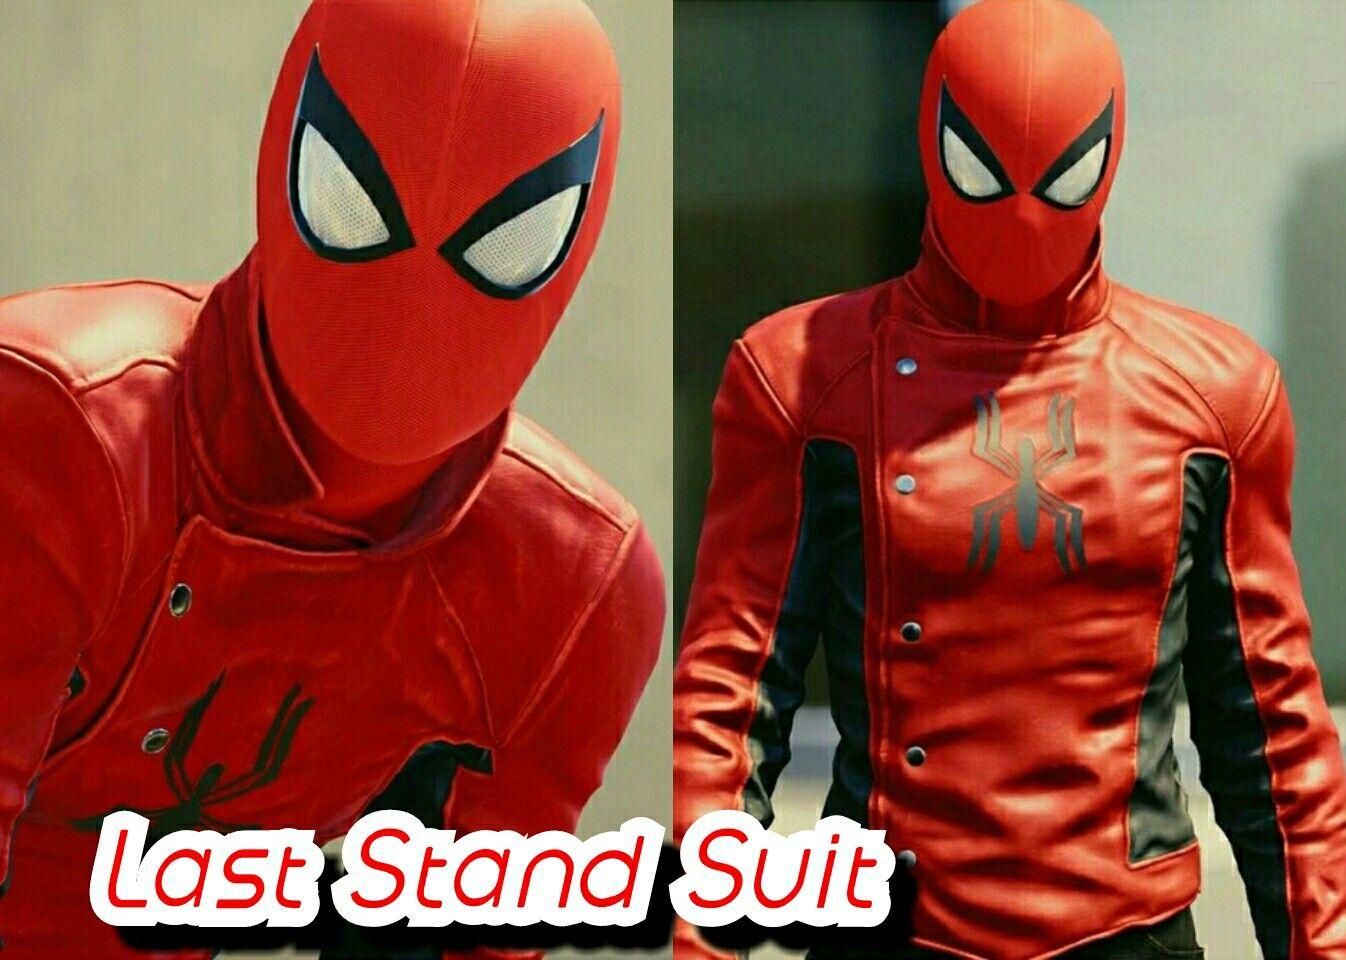 Last Stand Suit Spider man trilogy, Spiderman, Superhero